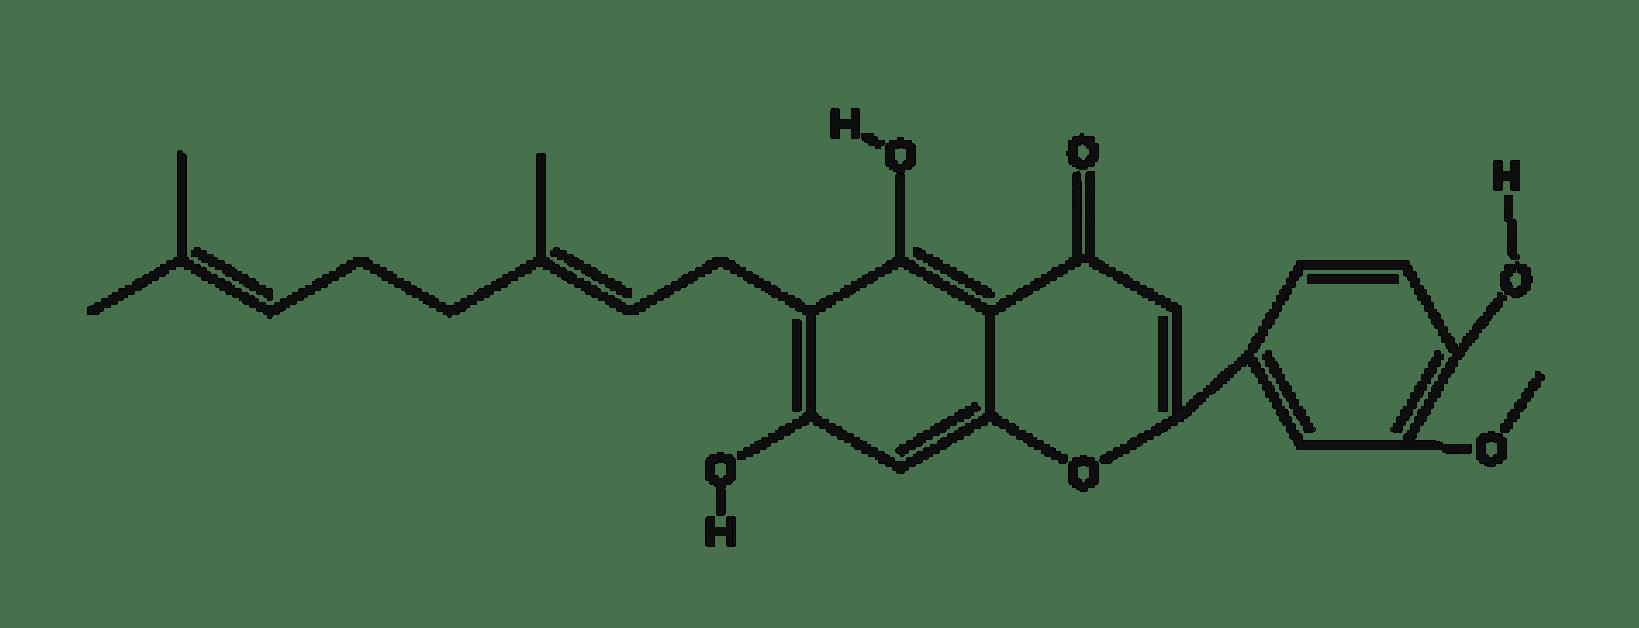 Cannflavin A